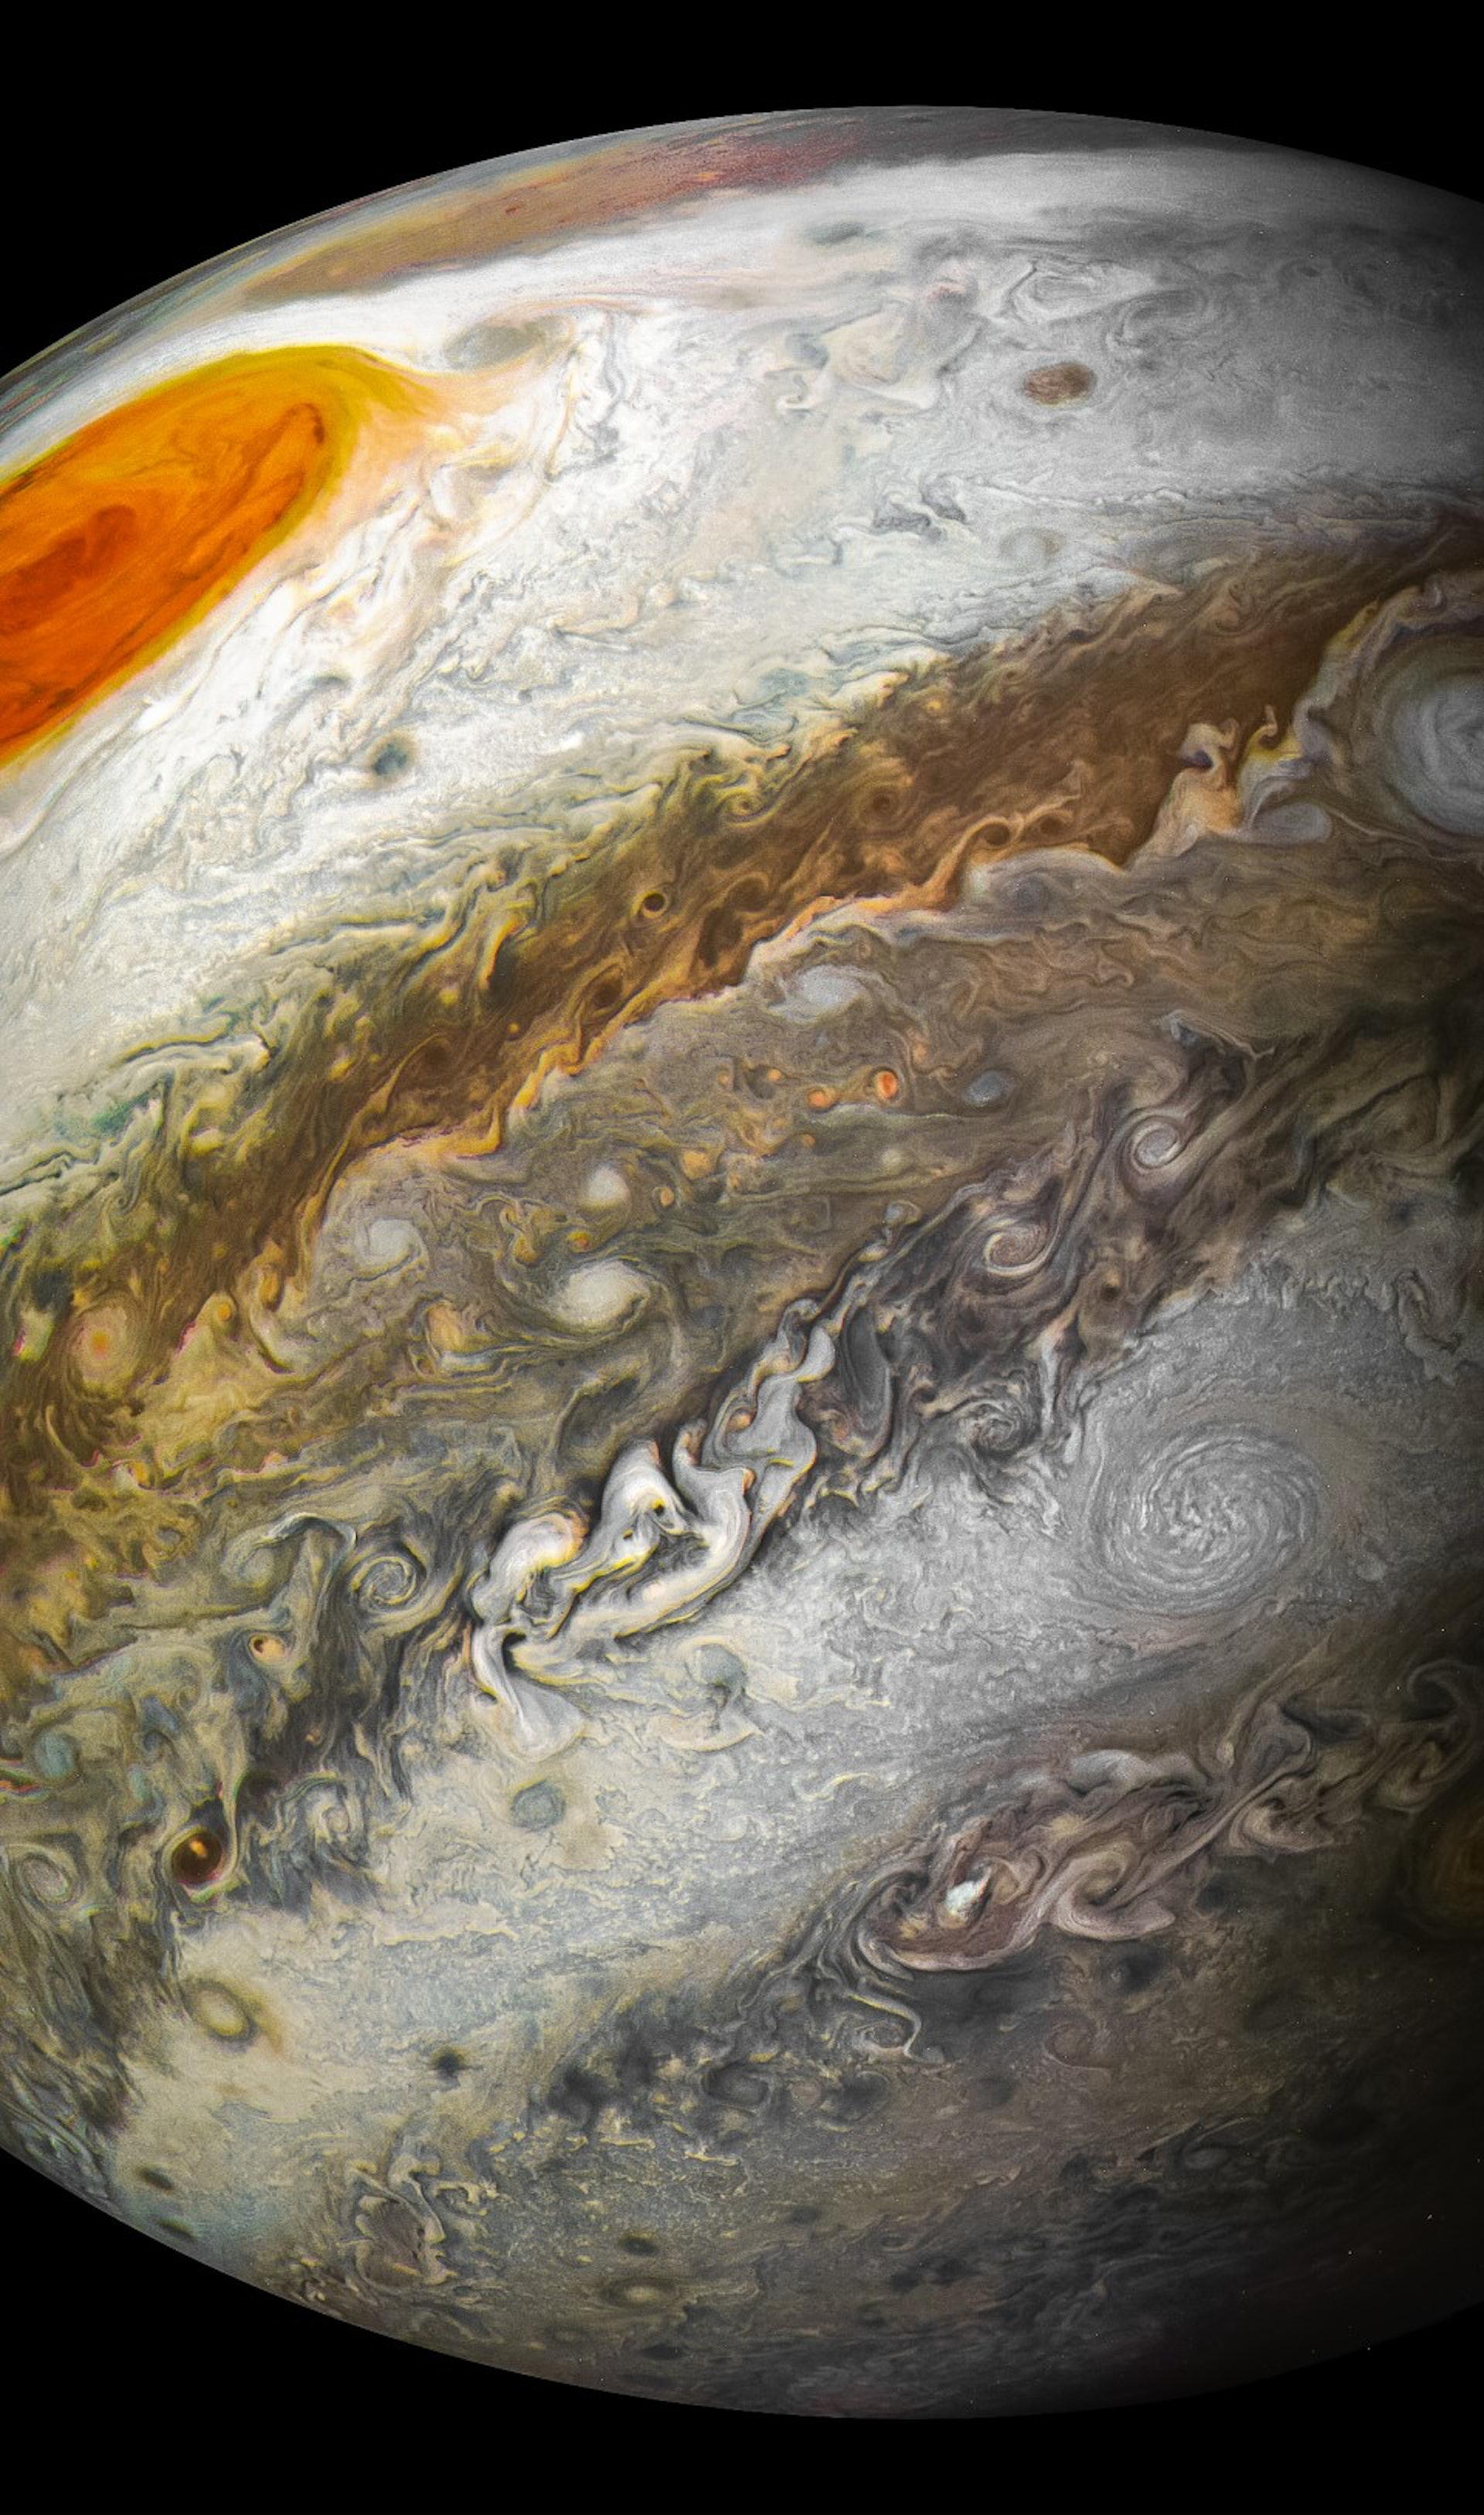 Jupiter's Great Red Spot Captured by Juno in Stunning NASA Photos